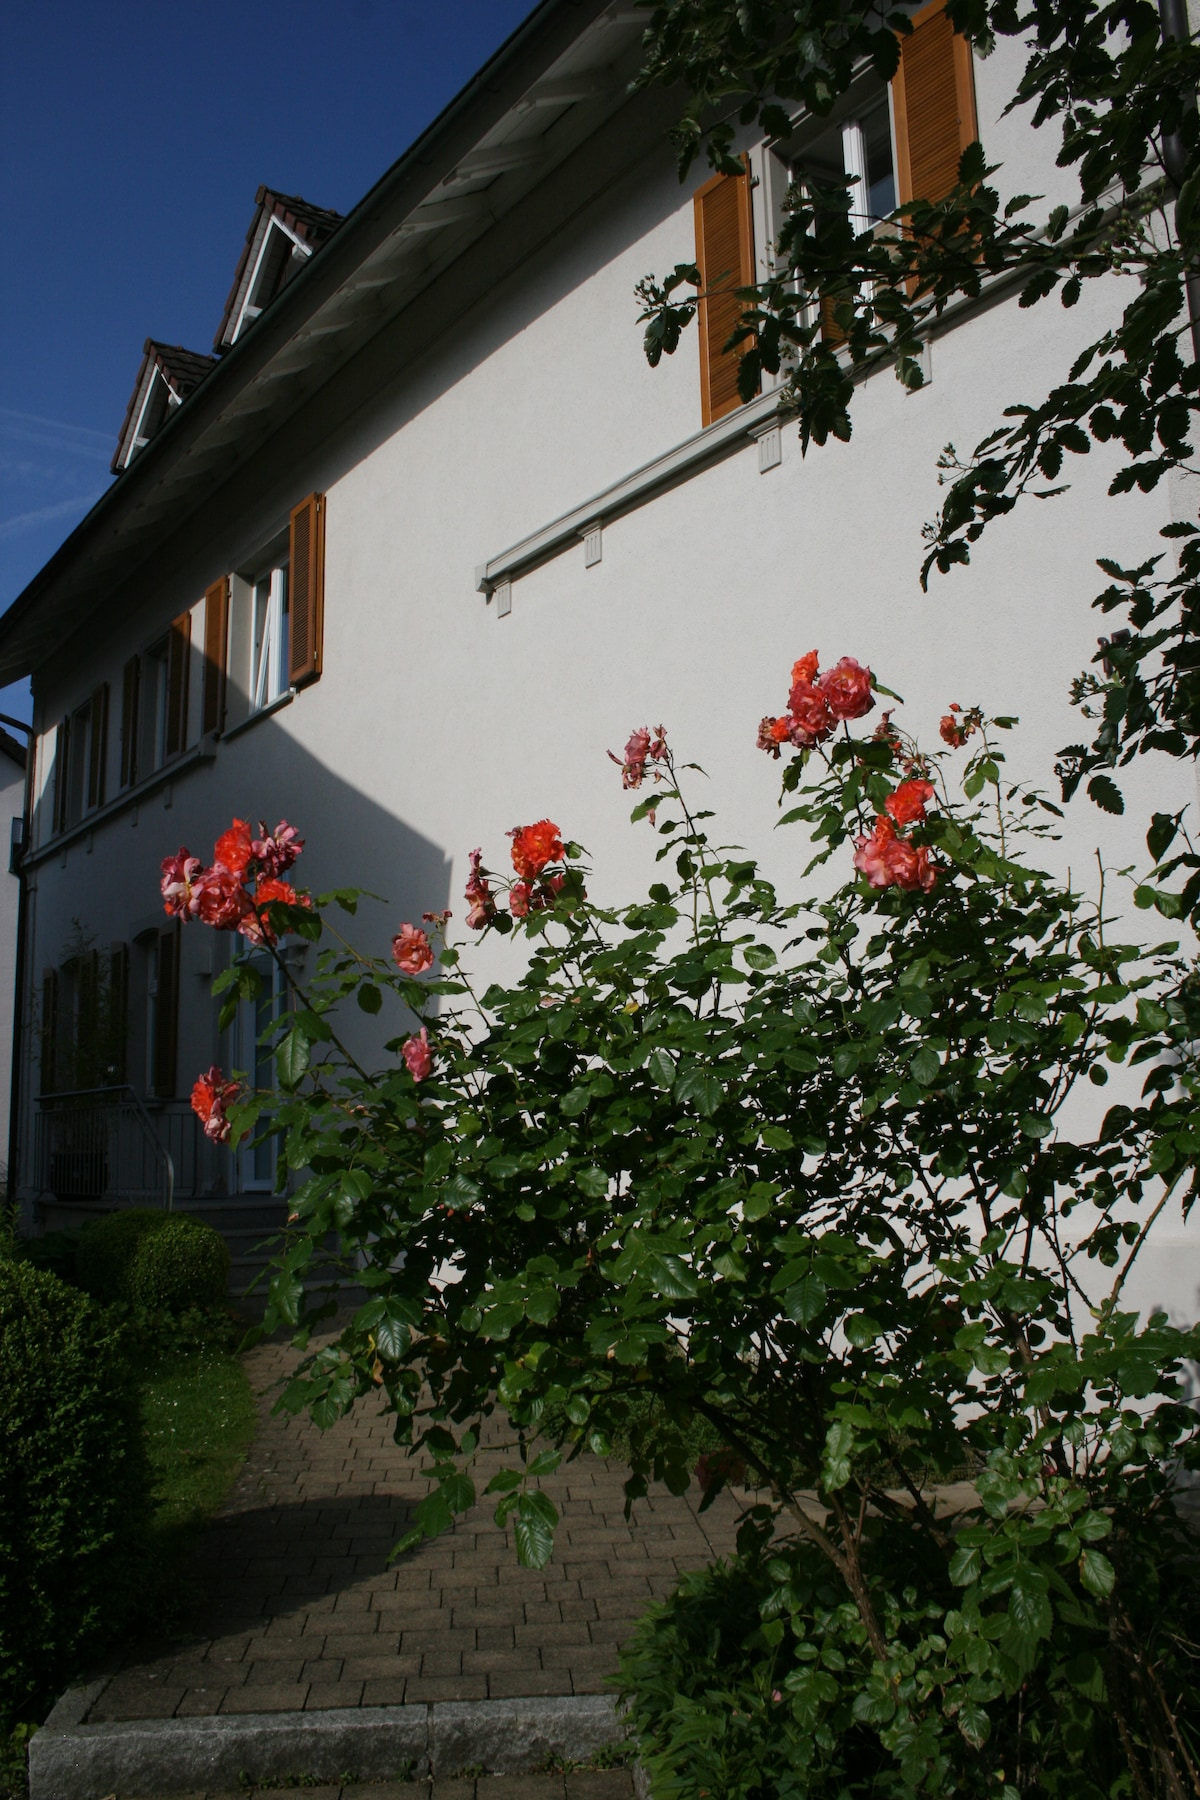 Elke Anna from Radolfzell